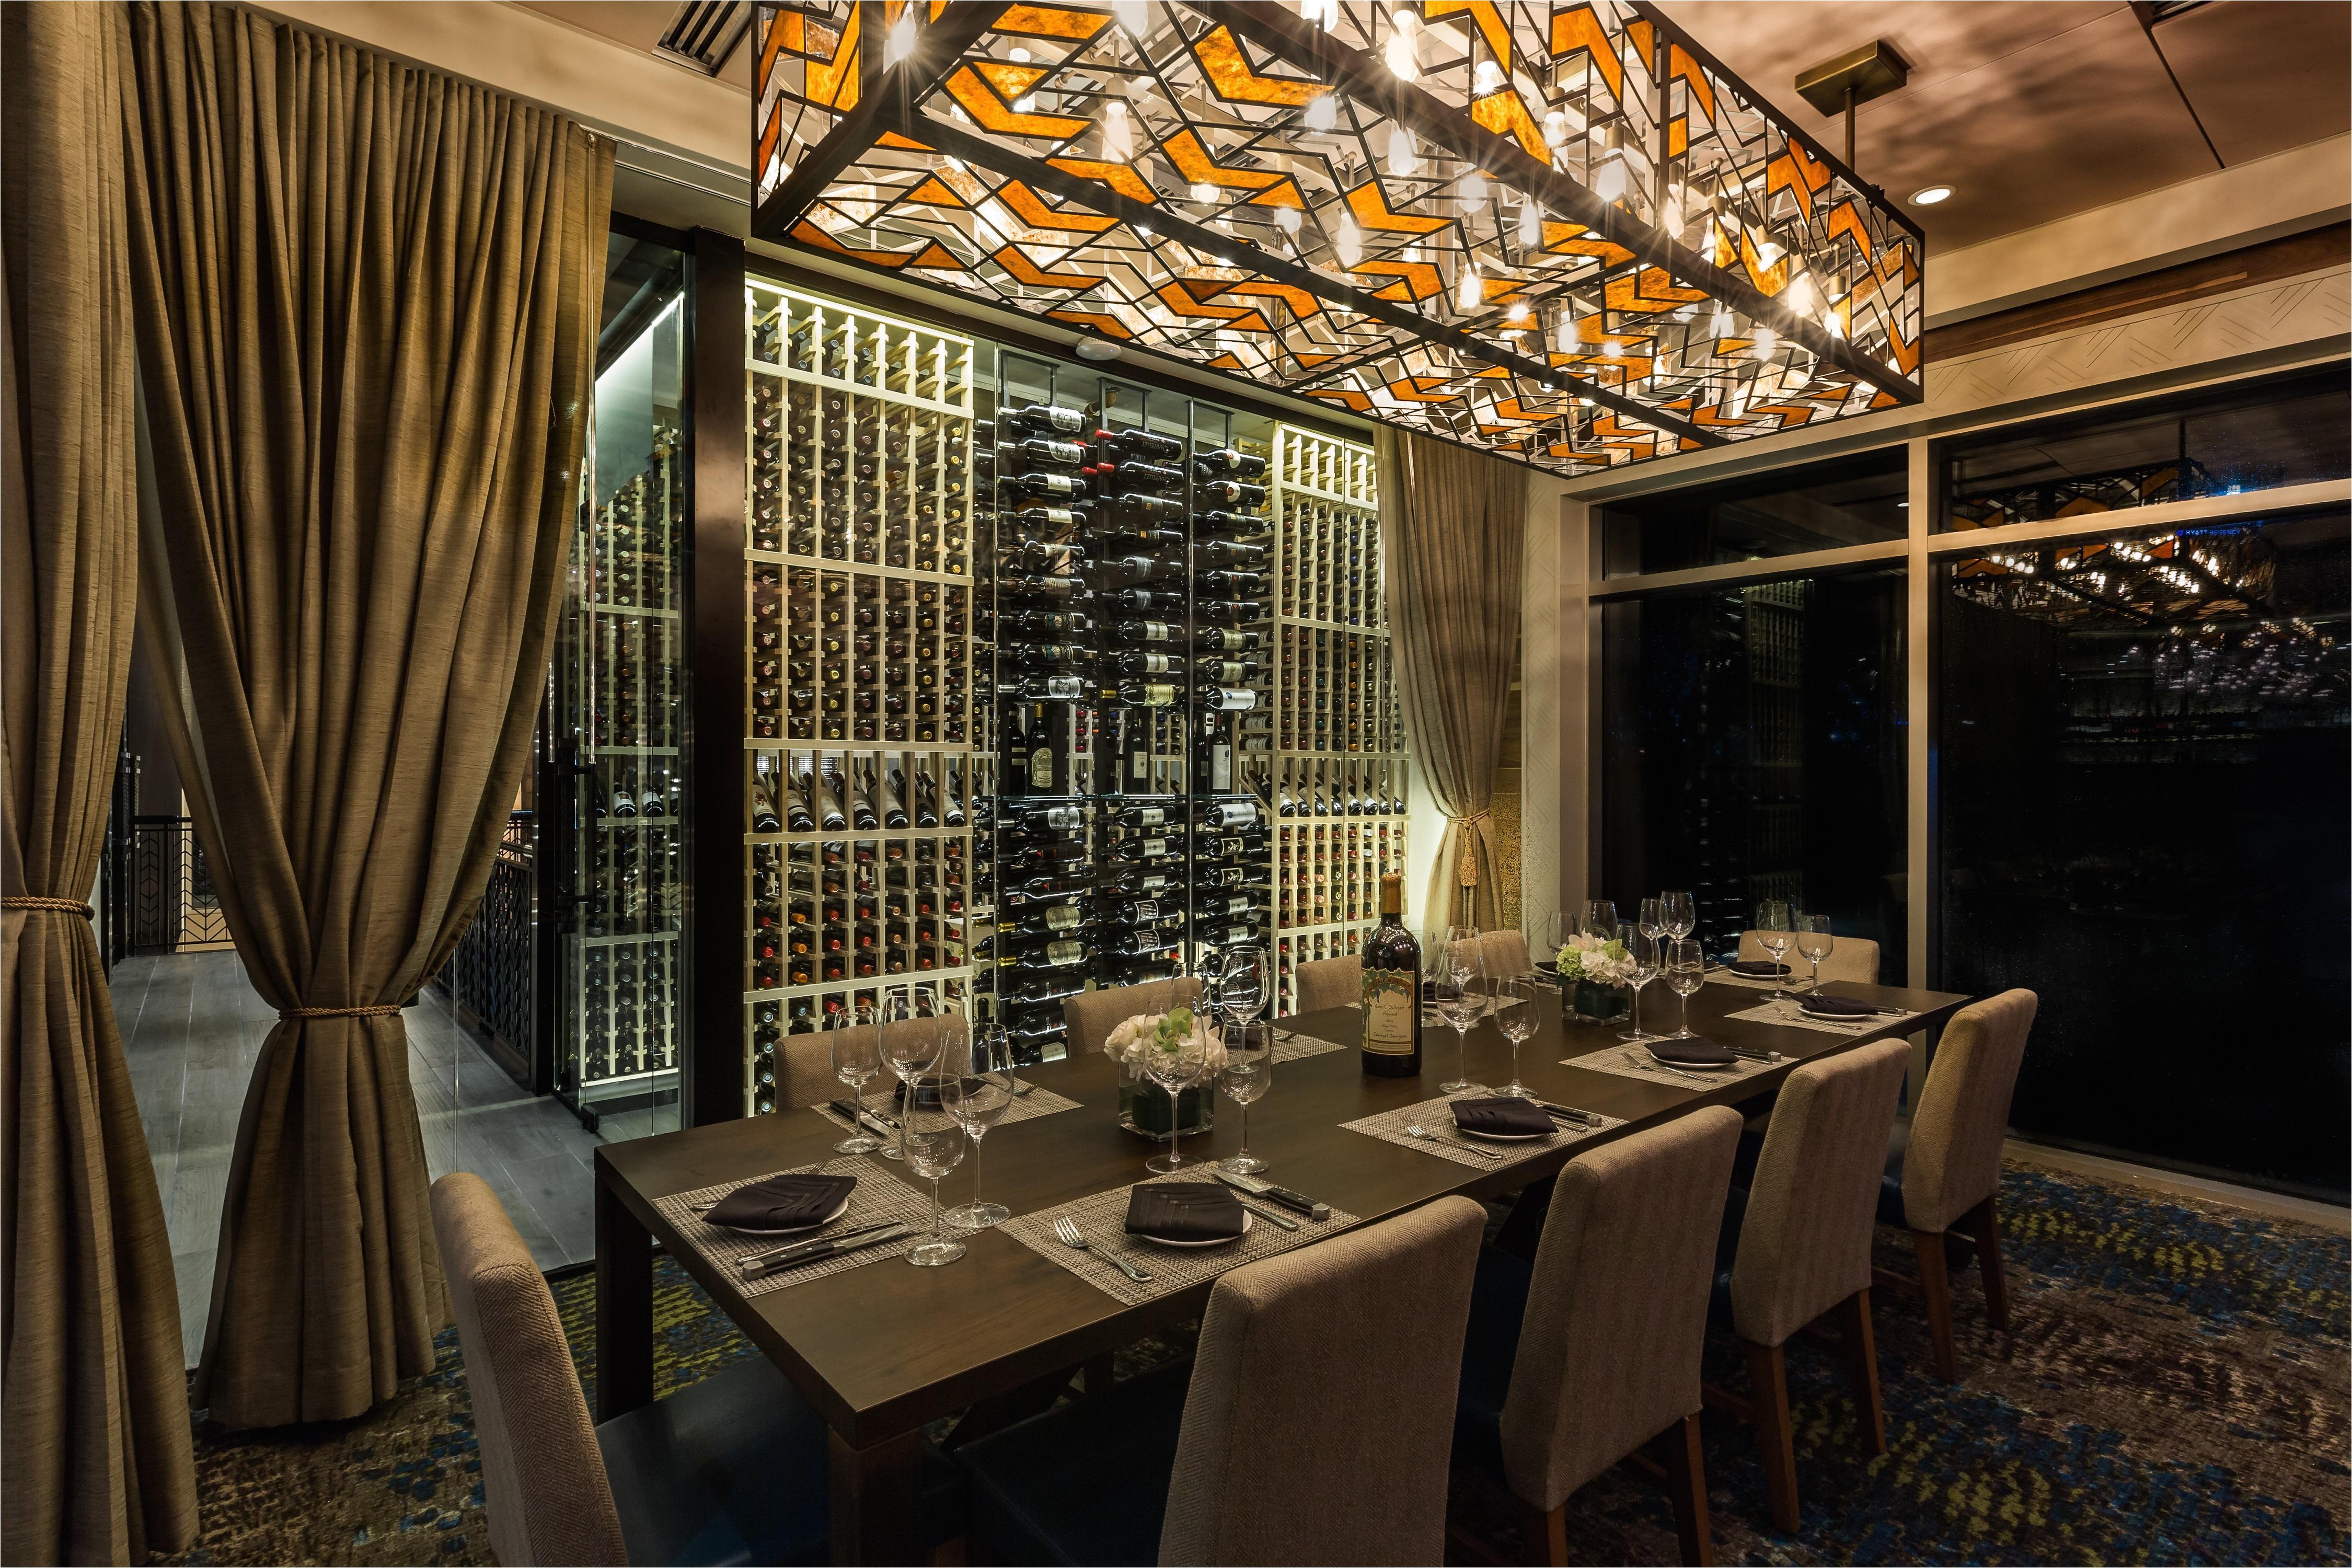 del frisco s double eagle steakhouse orlando eagle s nest private dining room